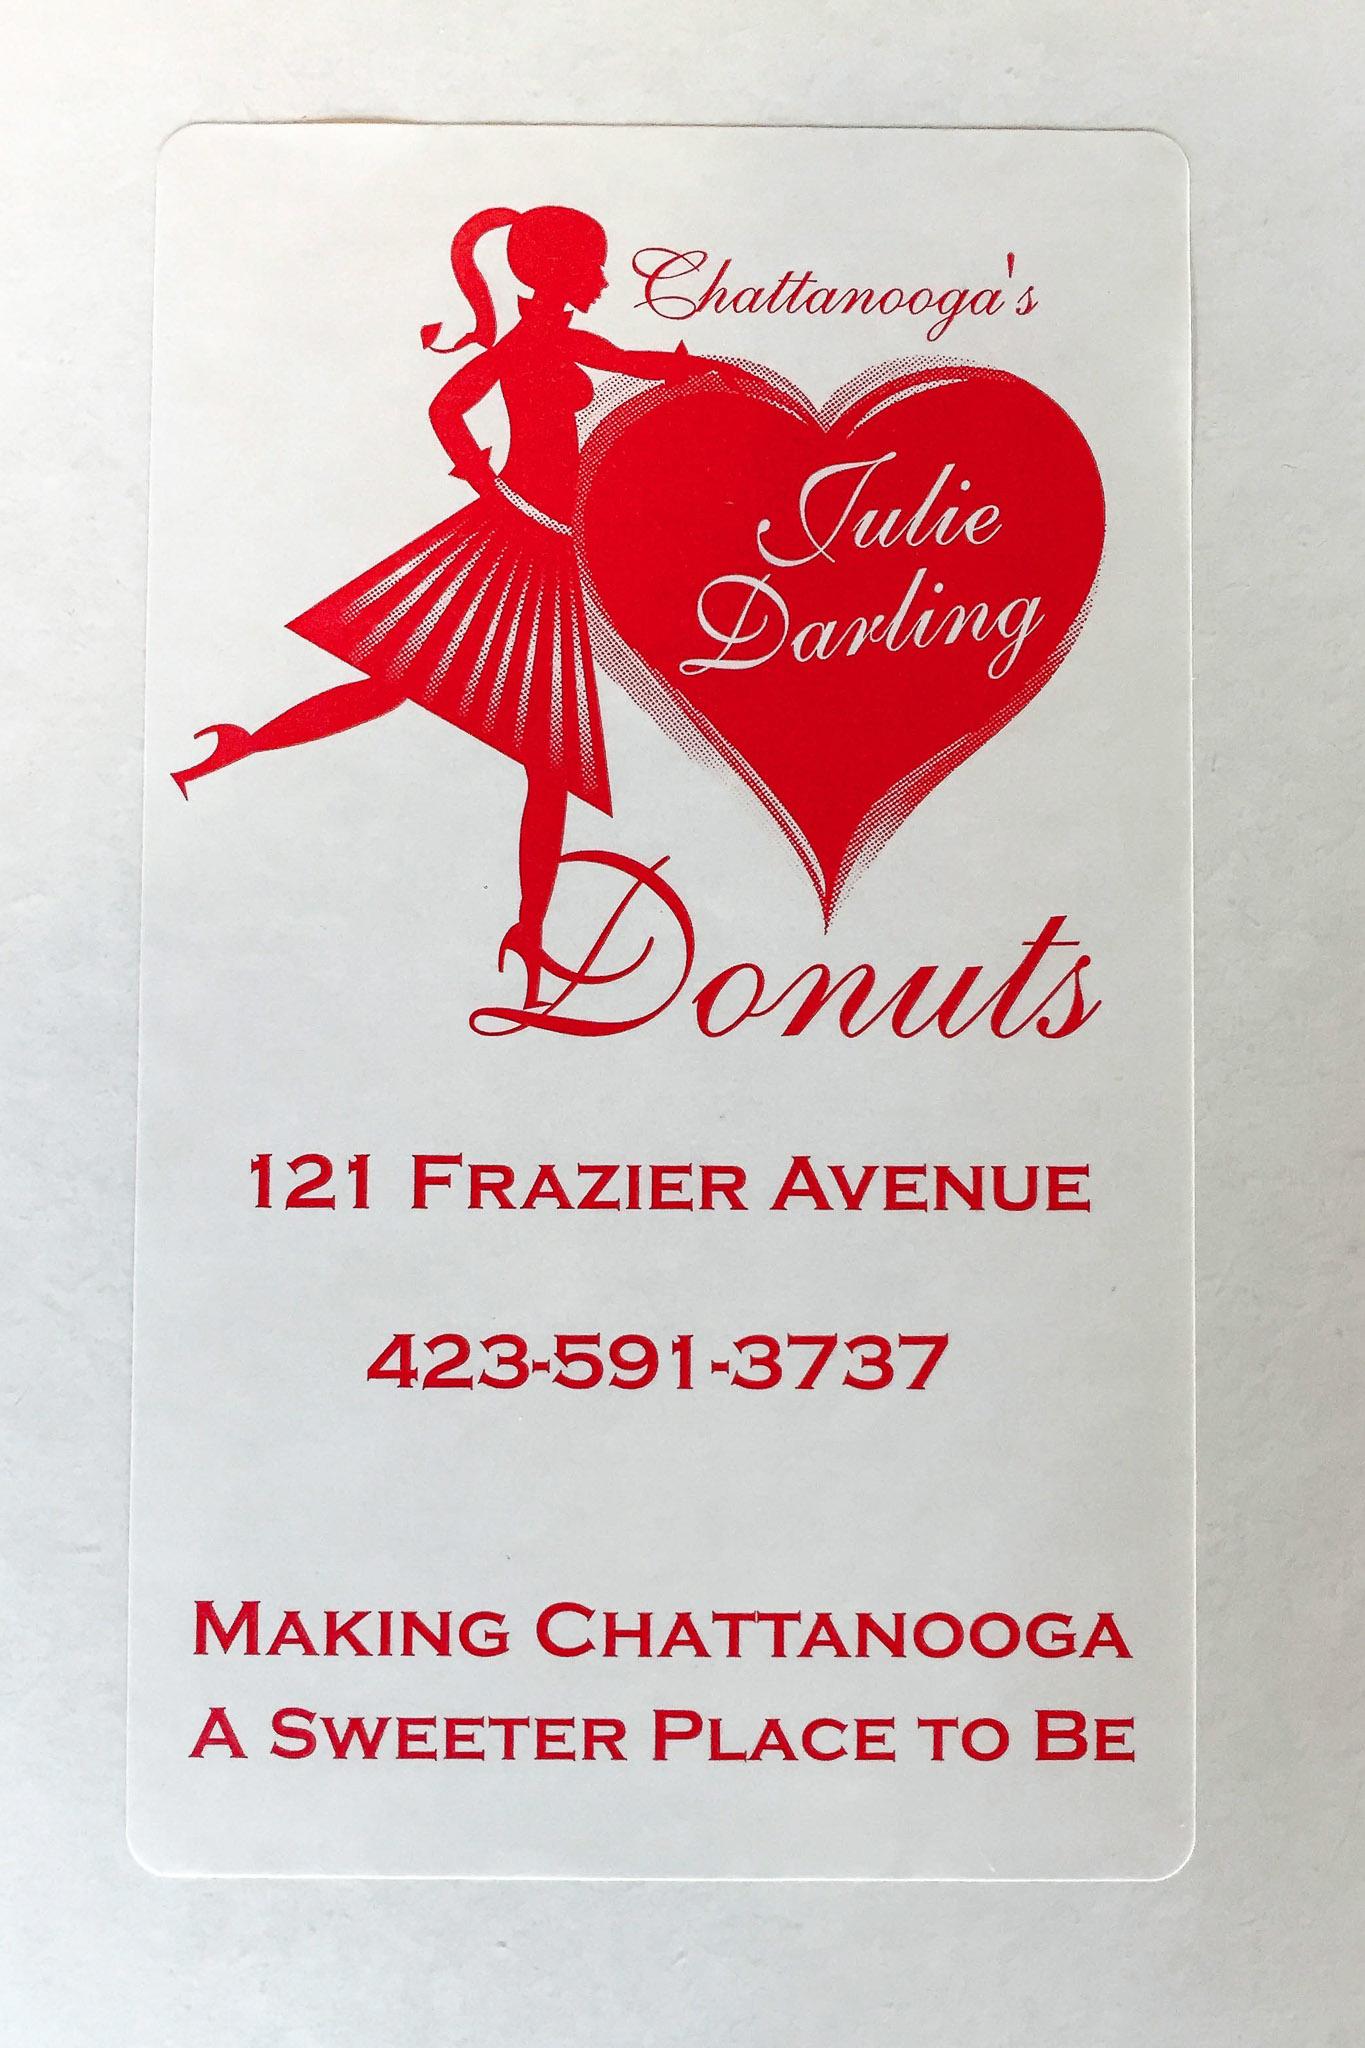 Julie Darling Donuts